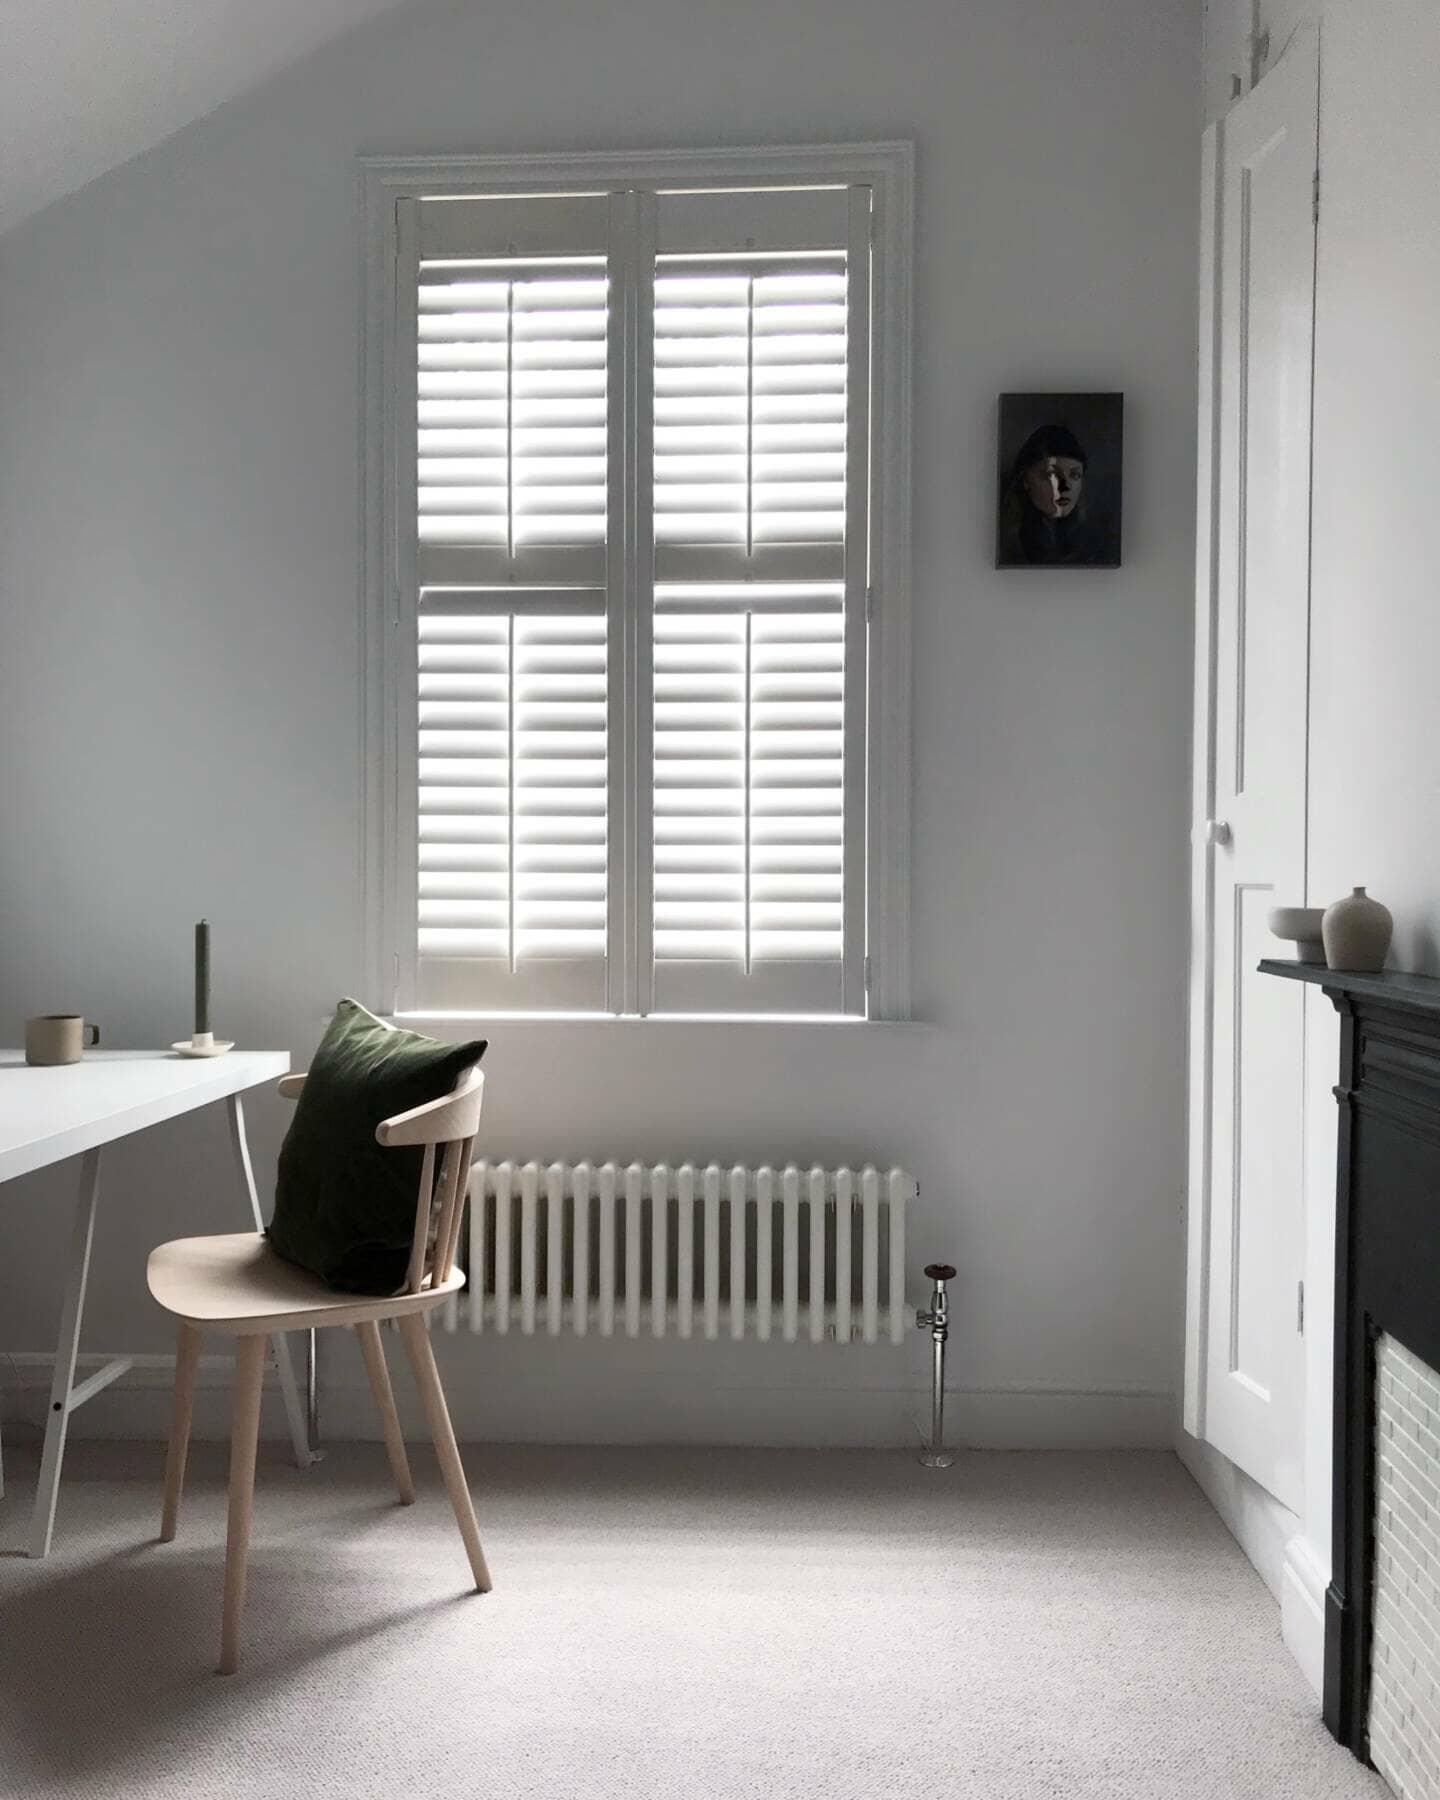 Donna's low level Milano Windsor column radiator under a window